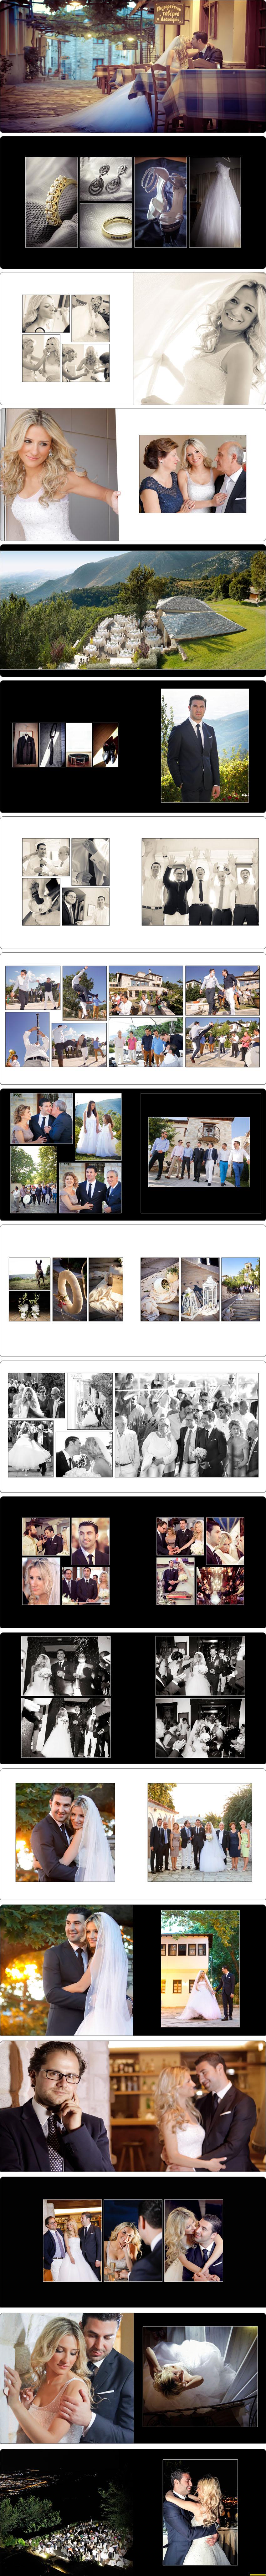 A location wedding in Pelion Greece